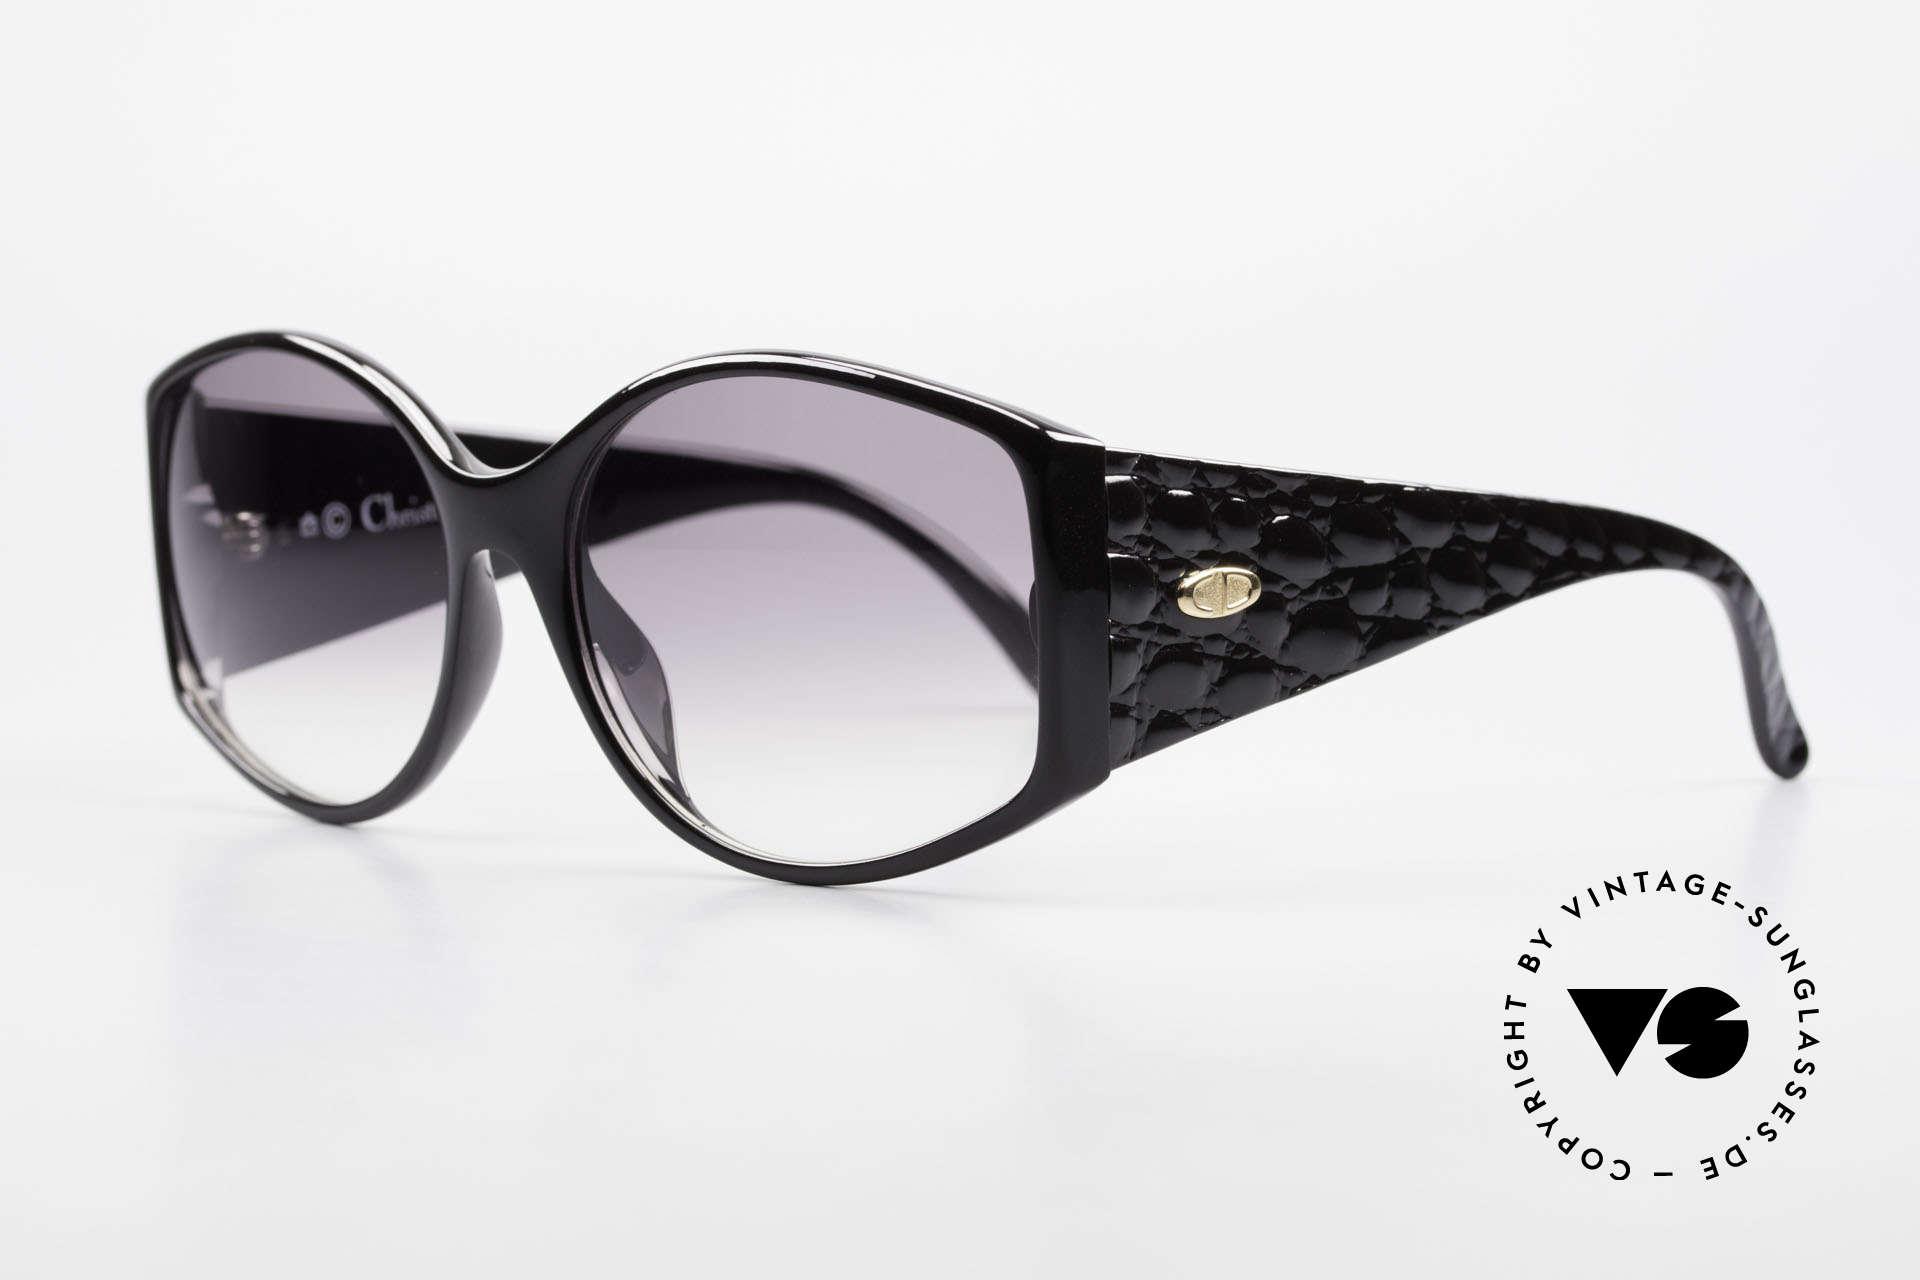 Christian Dior 2435 Designer Sunglasses Ladies 80's, 'Primadonna' or 'Diva' sunglasses - true vintage!, Made for Women